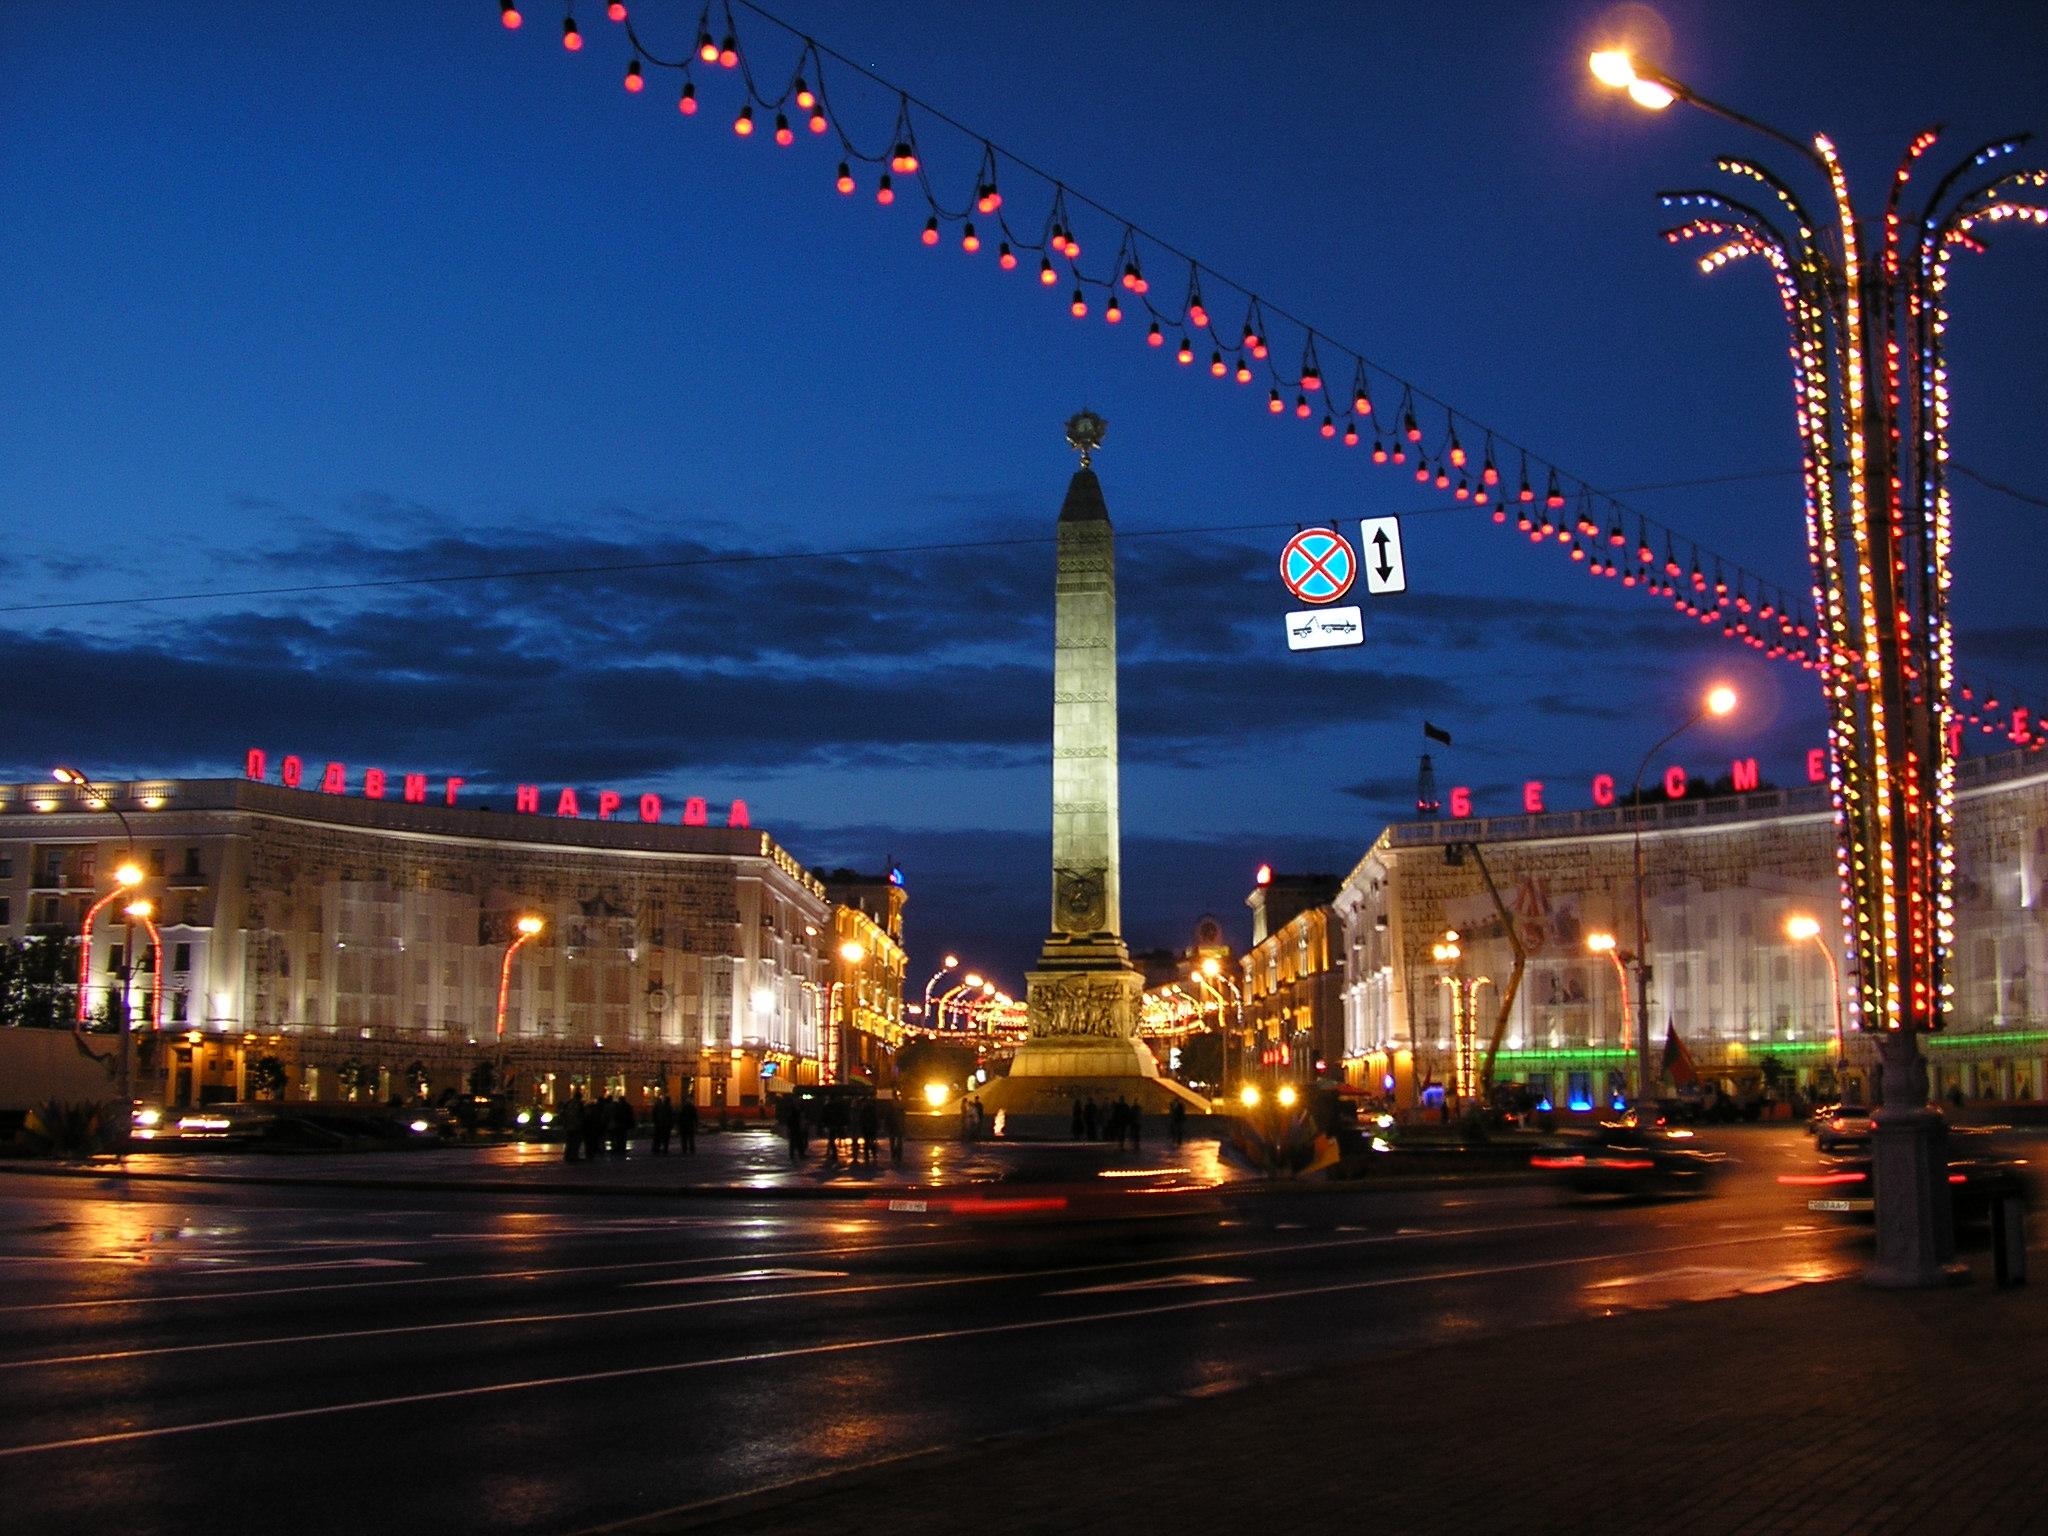 Victory Square in Minsk, Belarus